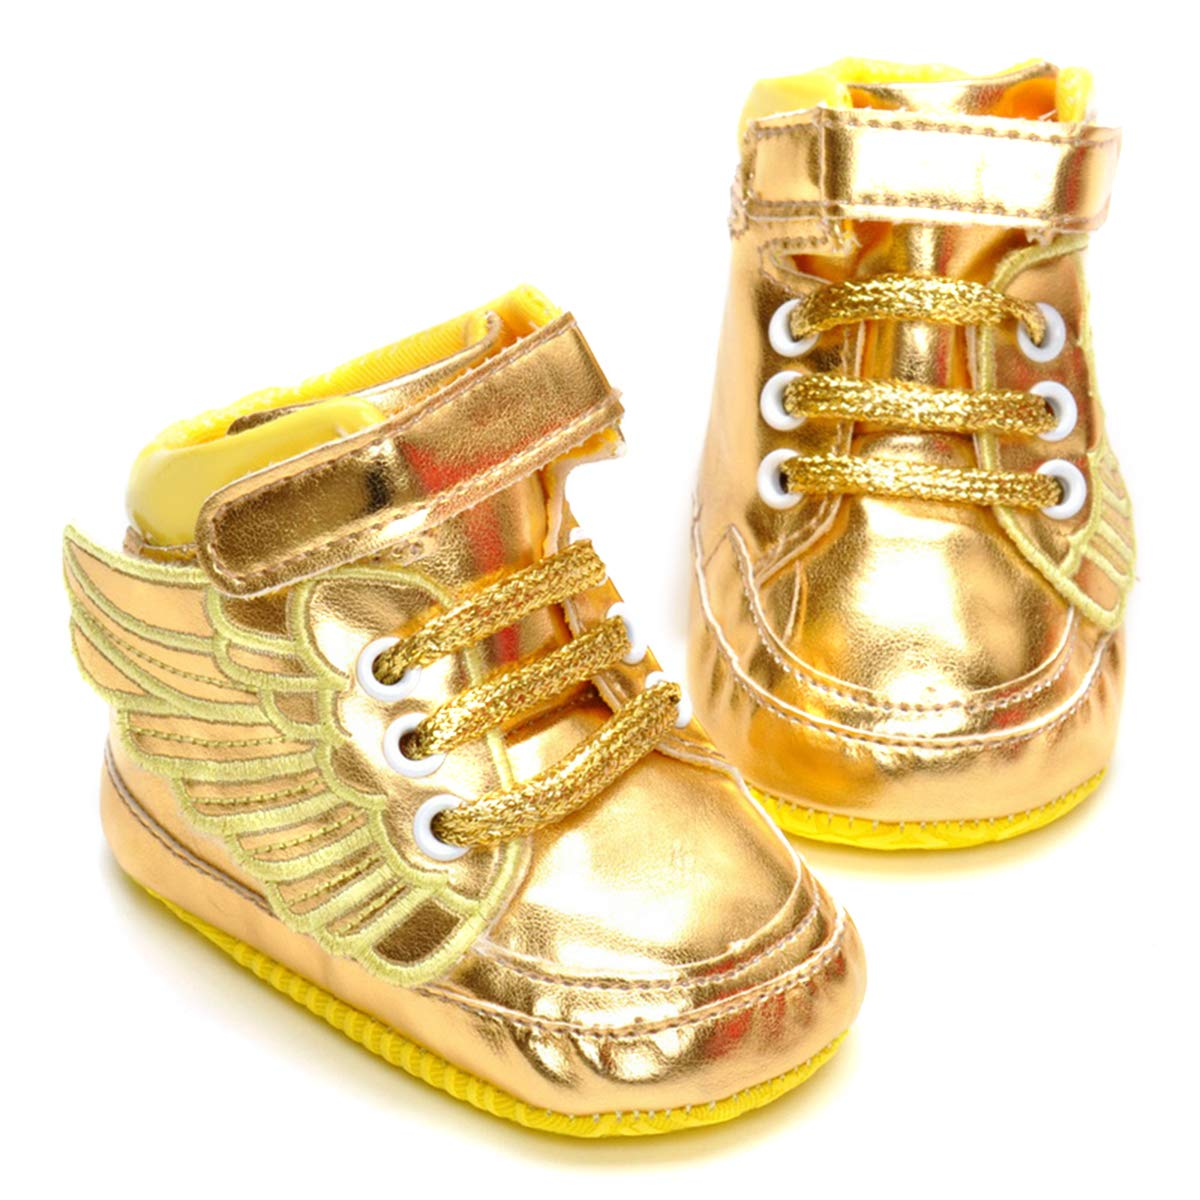 LIVEBOX Infant Baby Girls' Angel Wings Premium Soft Cotton Sole Prewalker Toddler Sneaker Shoes (S: 0~6 Months,Golden)